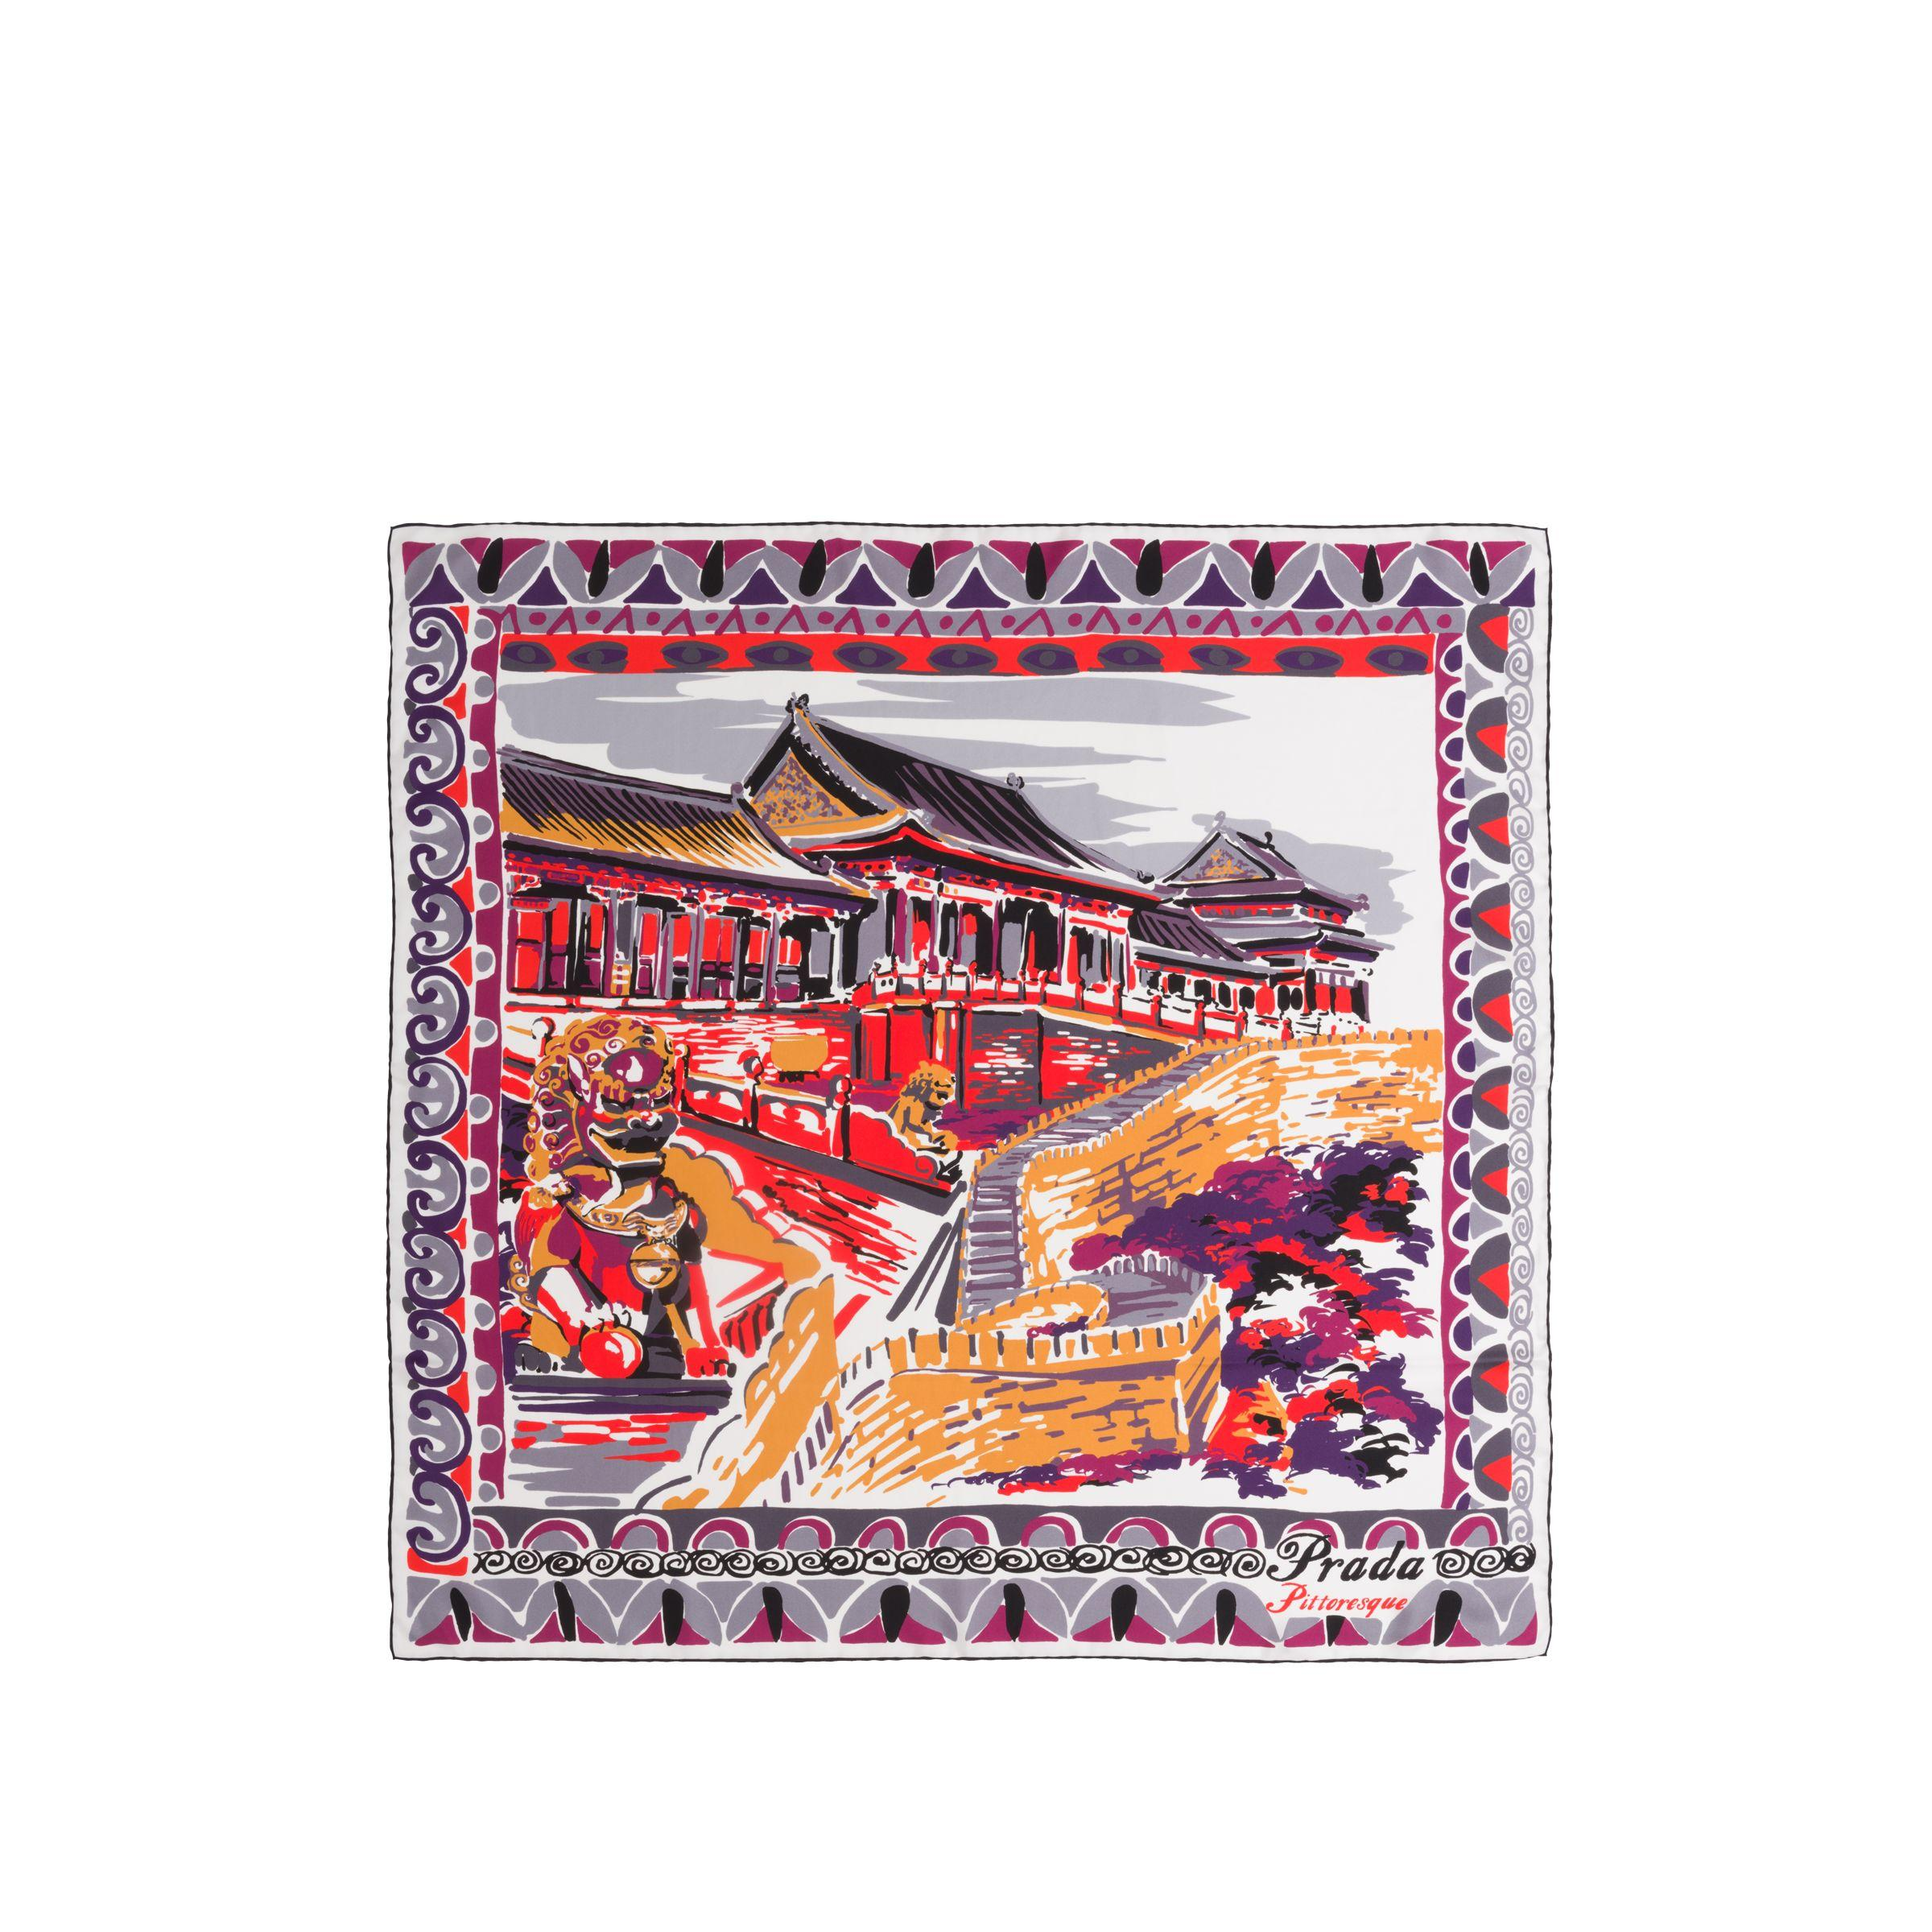 0002ada2c1 Lyst - Prada Pittoresque Beijing Printed 90 Silk Foulard in Purple